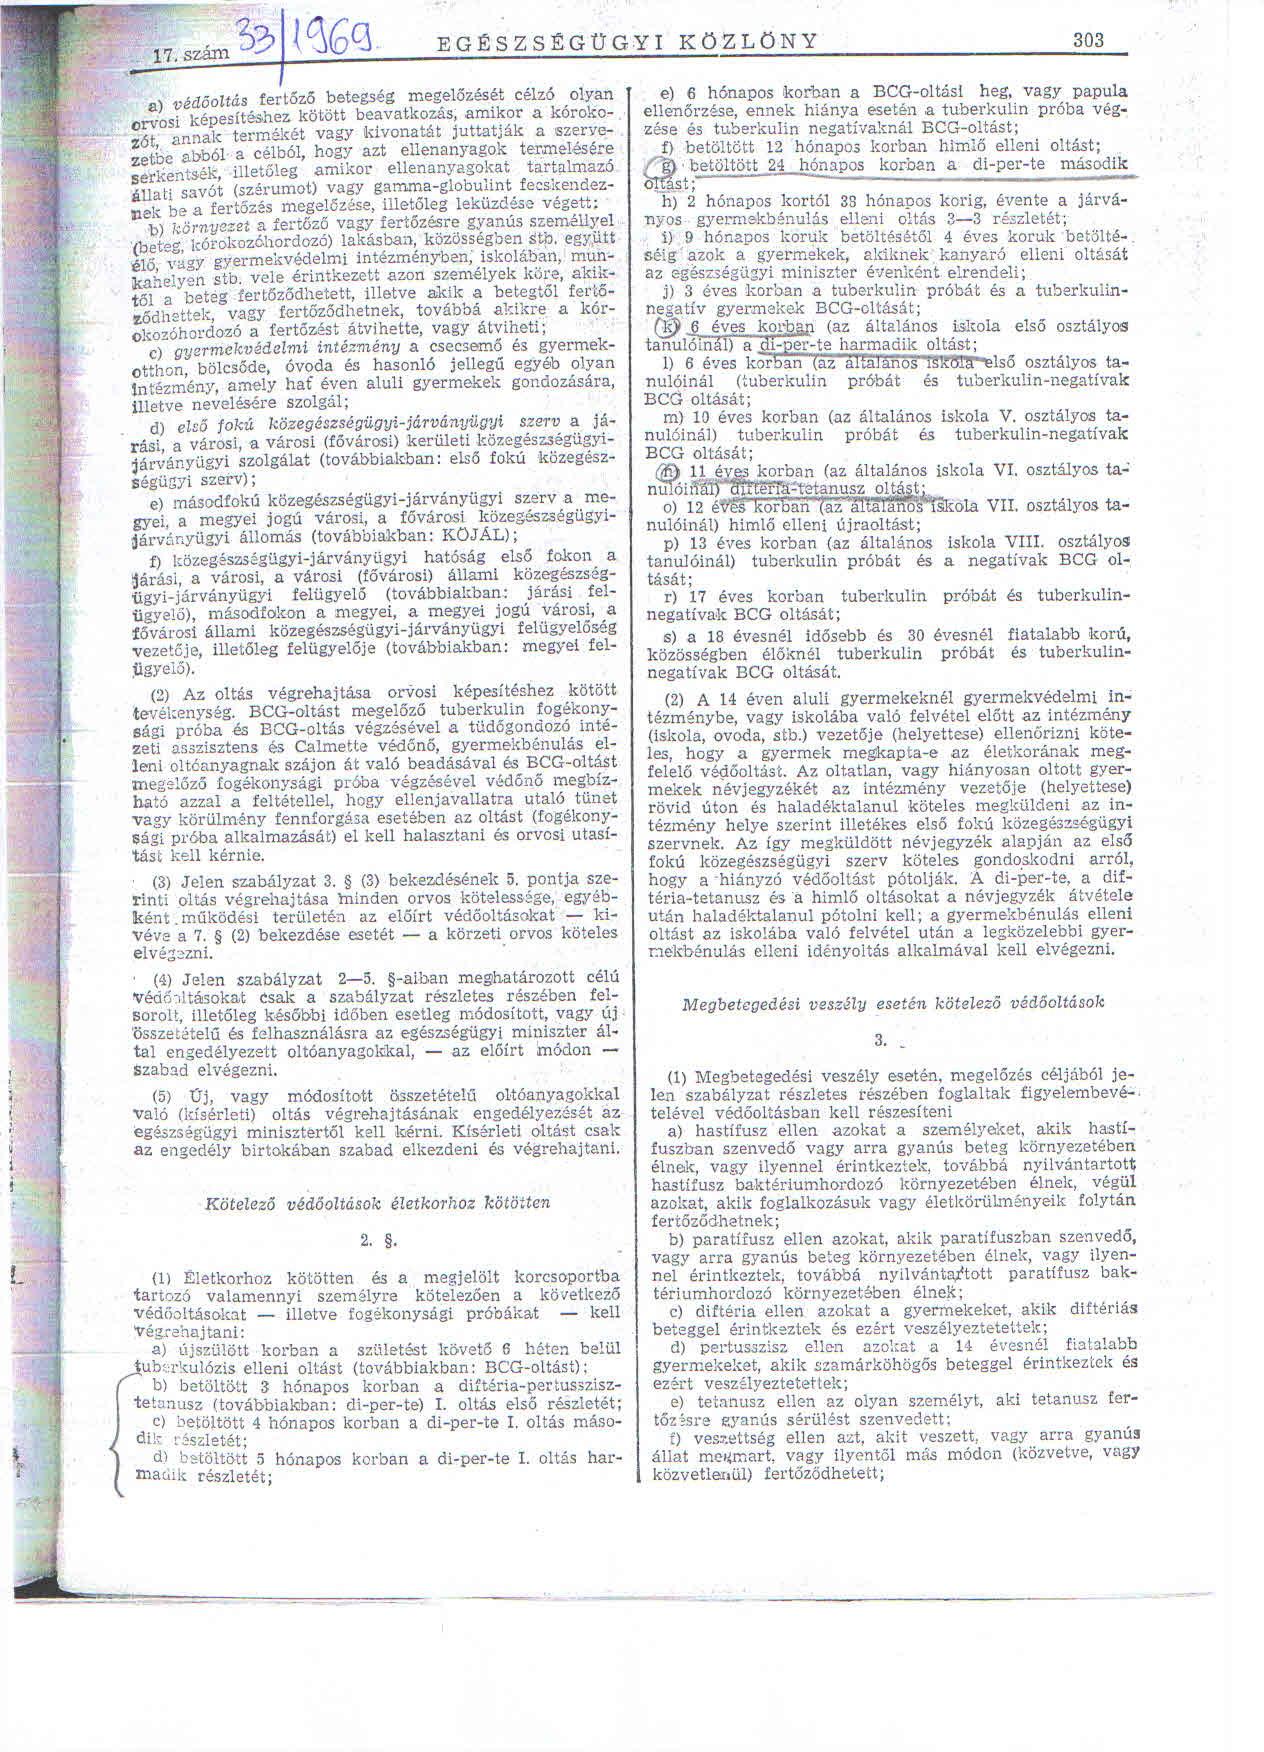 kotelezo_vedooltasok_1969_2.jpg